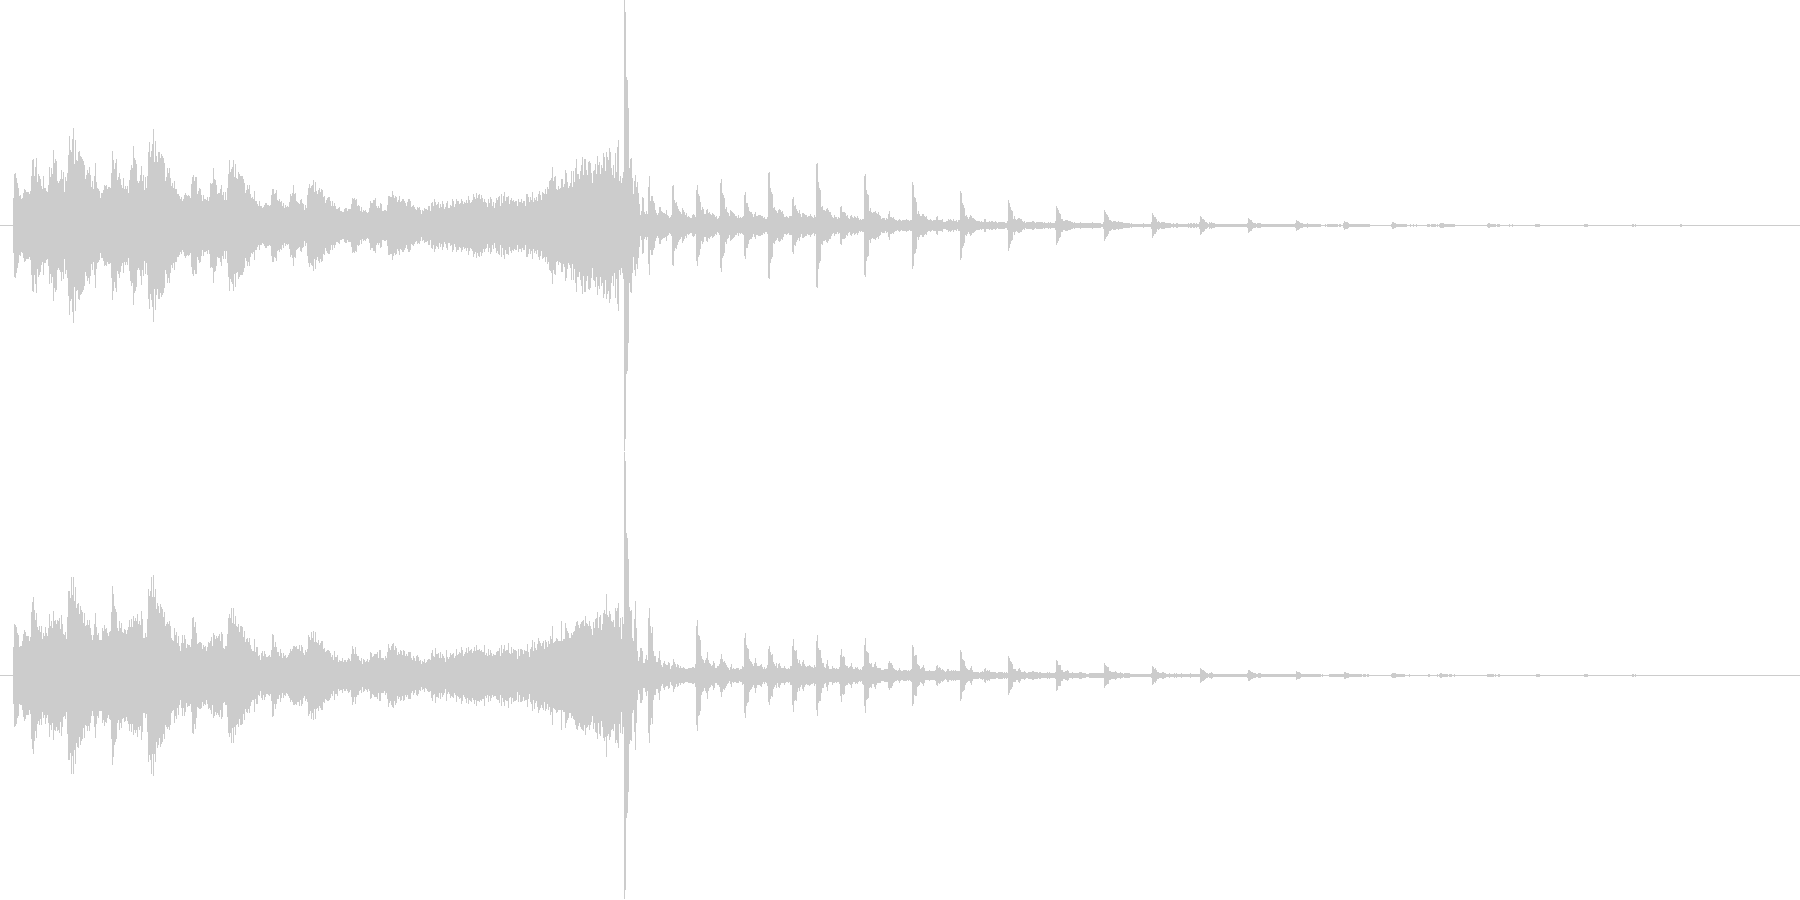 CMの企業ロゴ/緊張感のあるタイトルロゴの未再生の波形